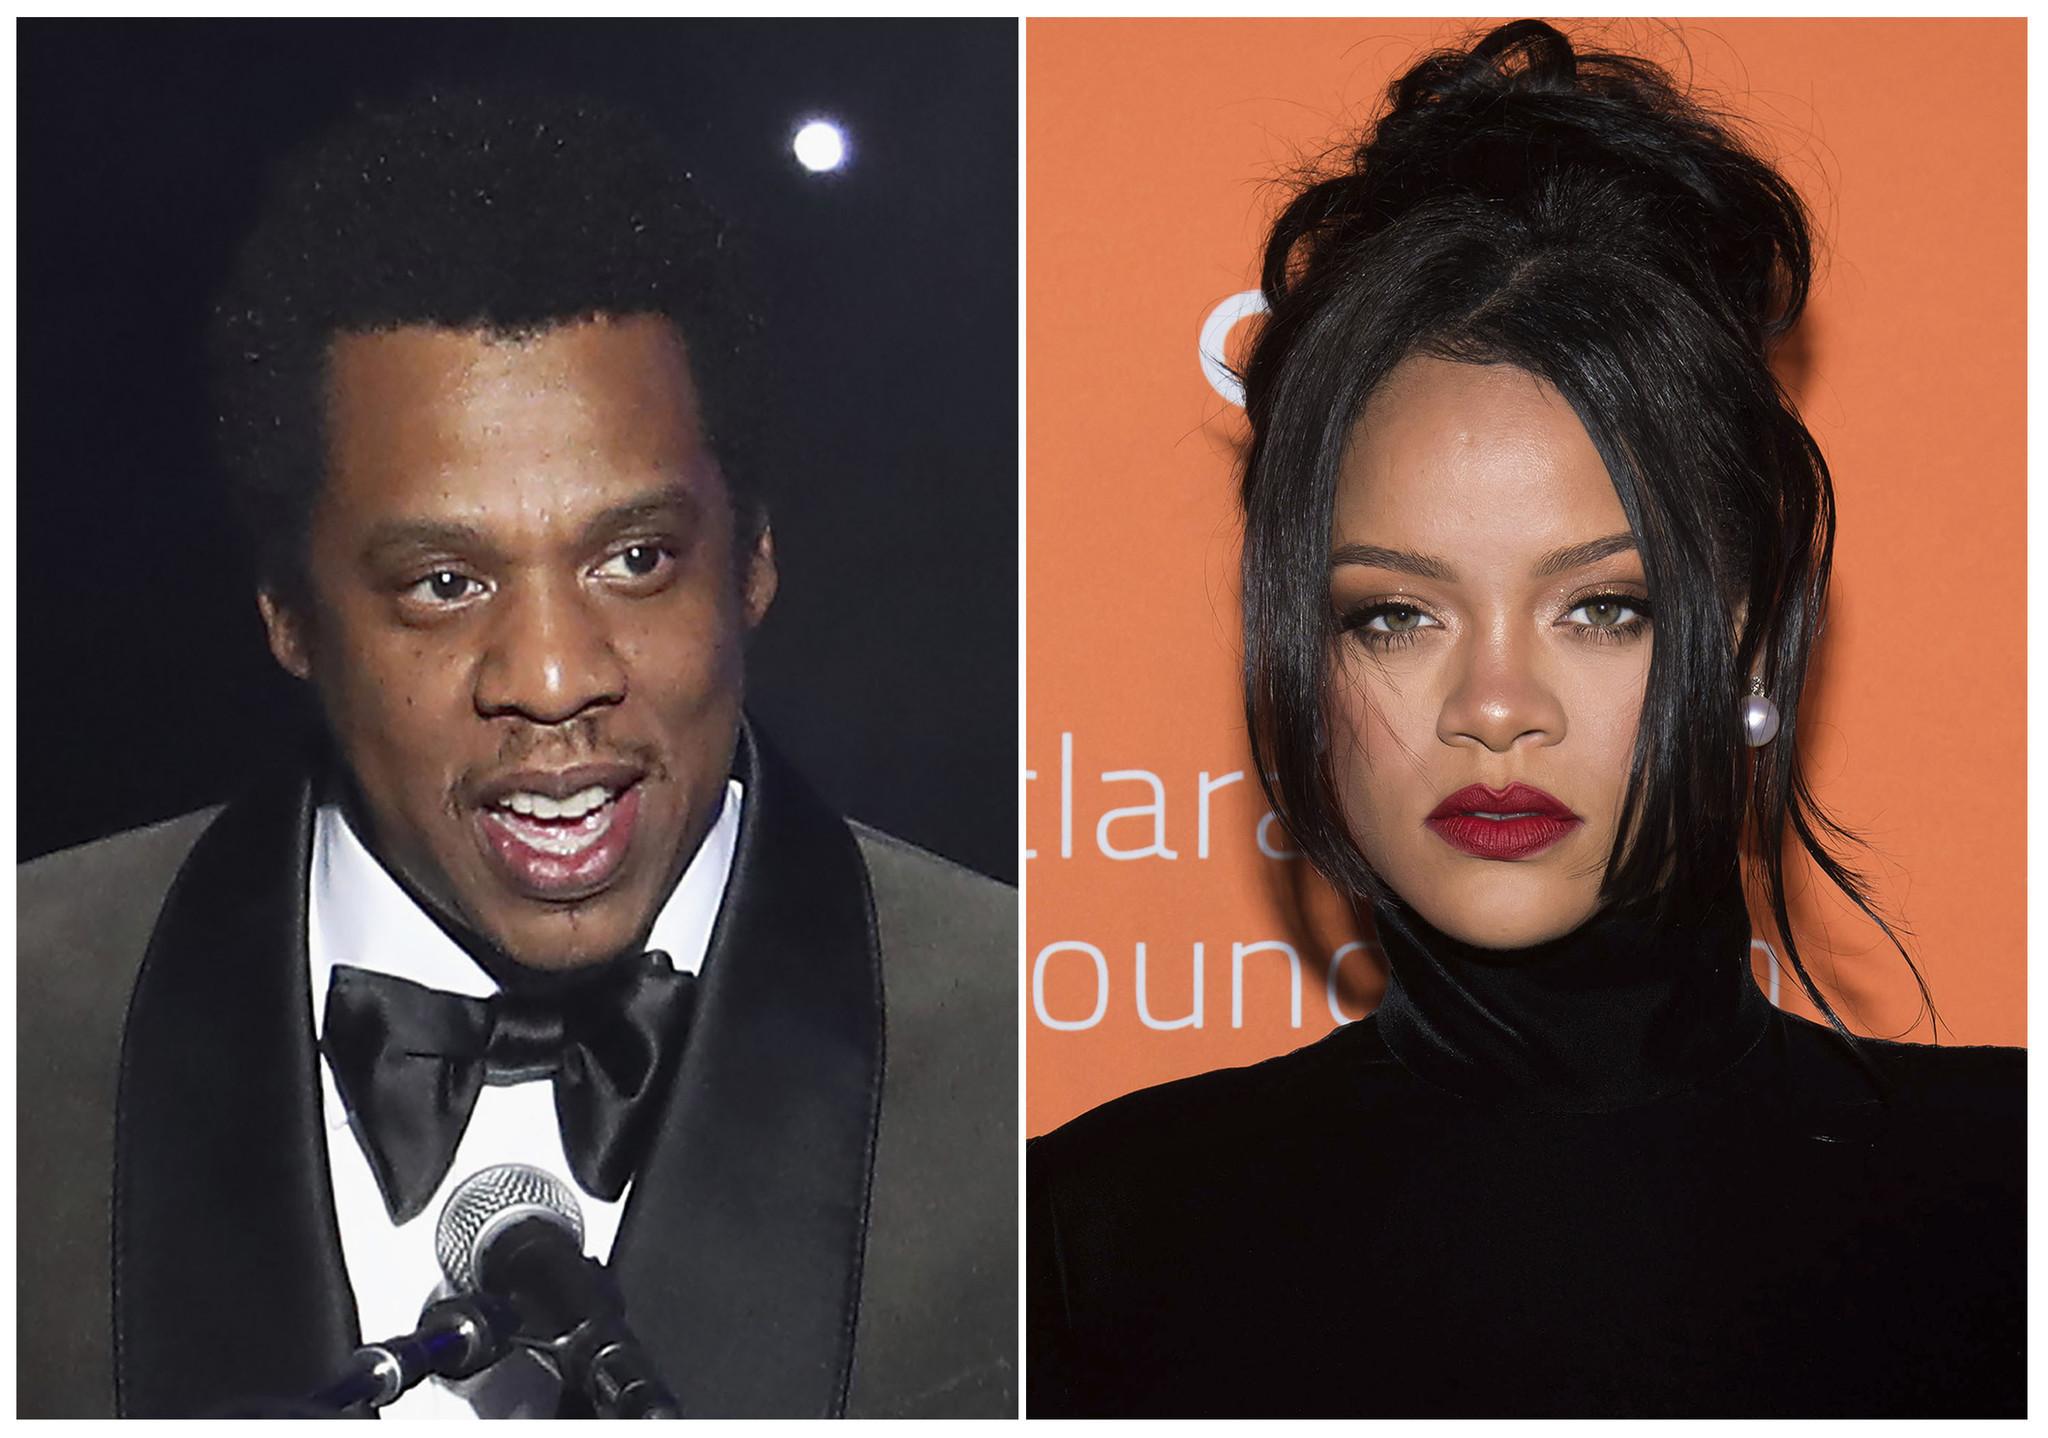 Rihanna and Jay-Z's foundations donating $2 million to help in coronavirus fight